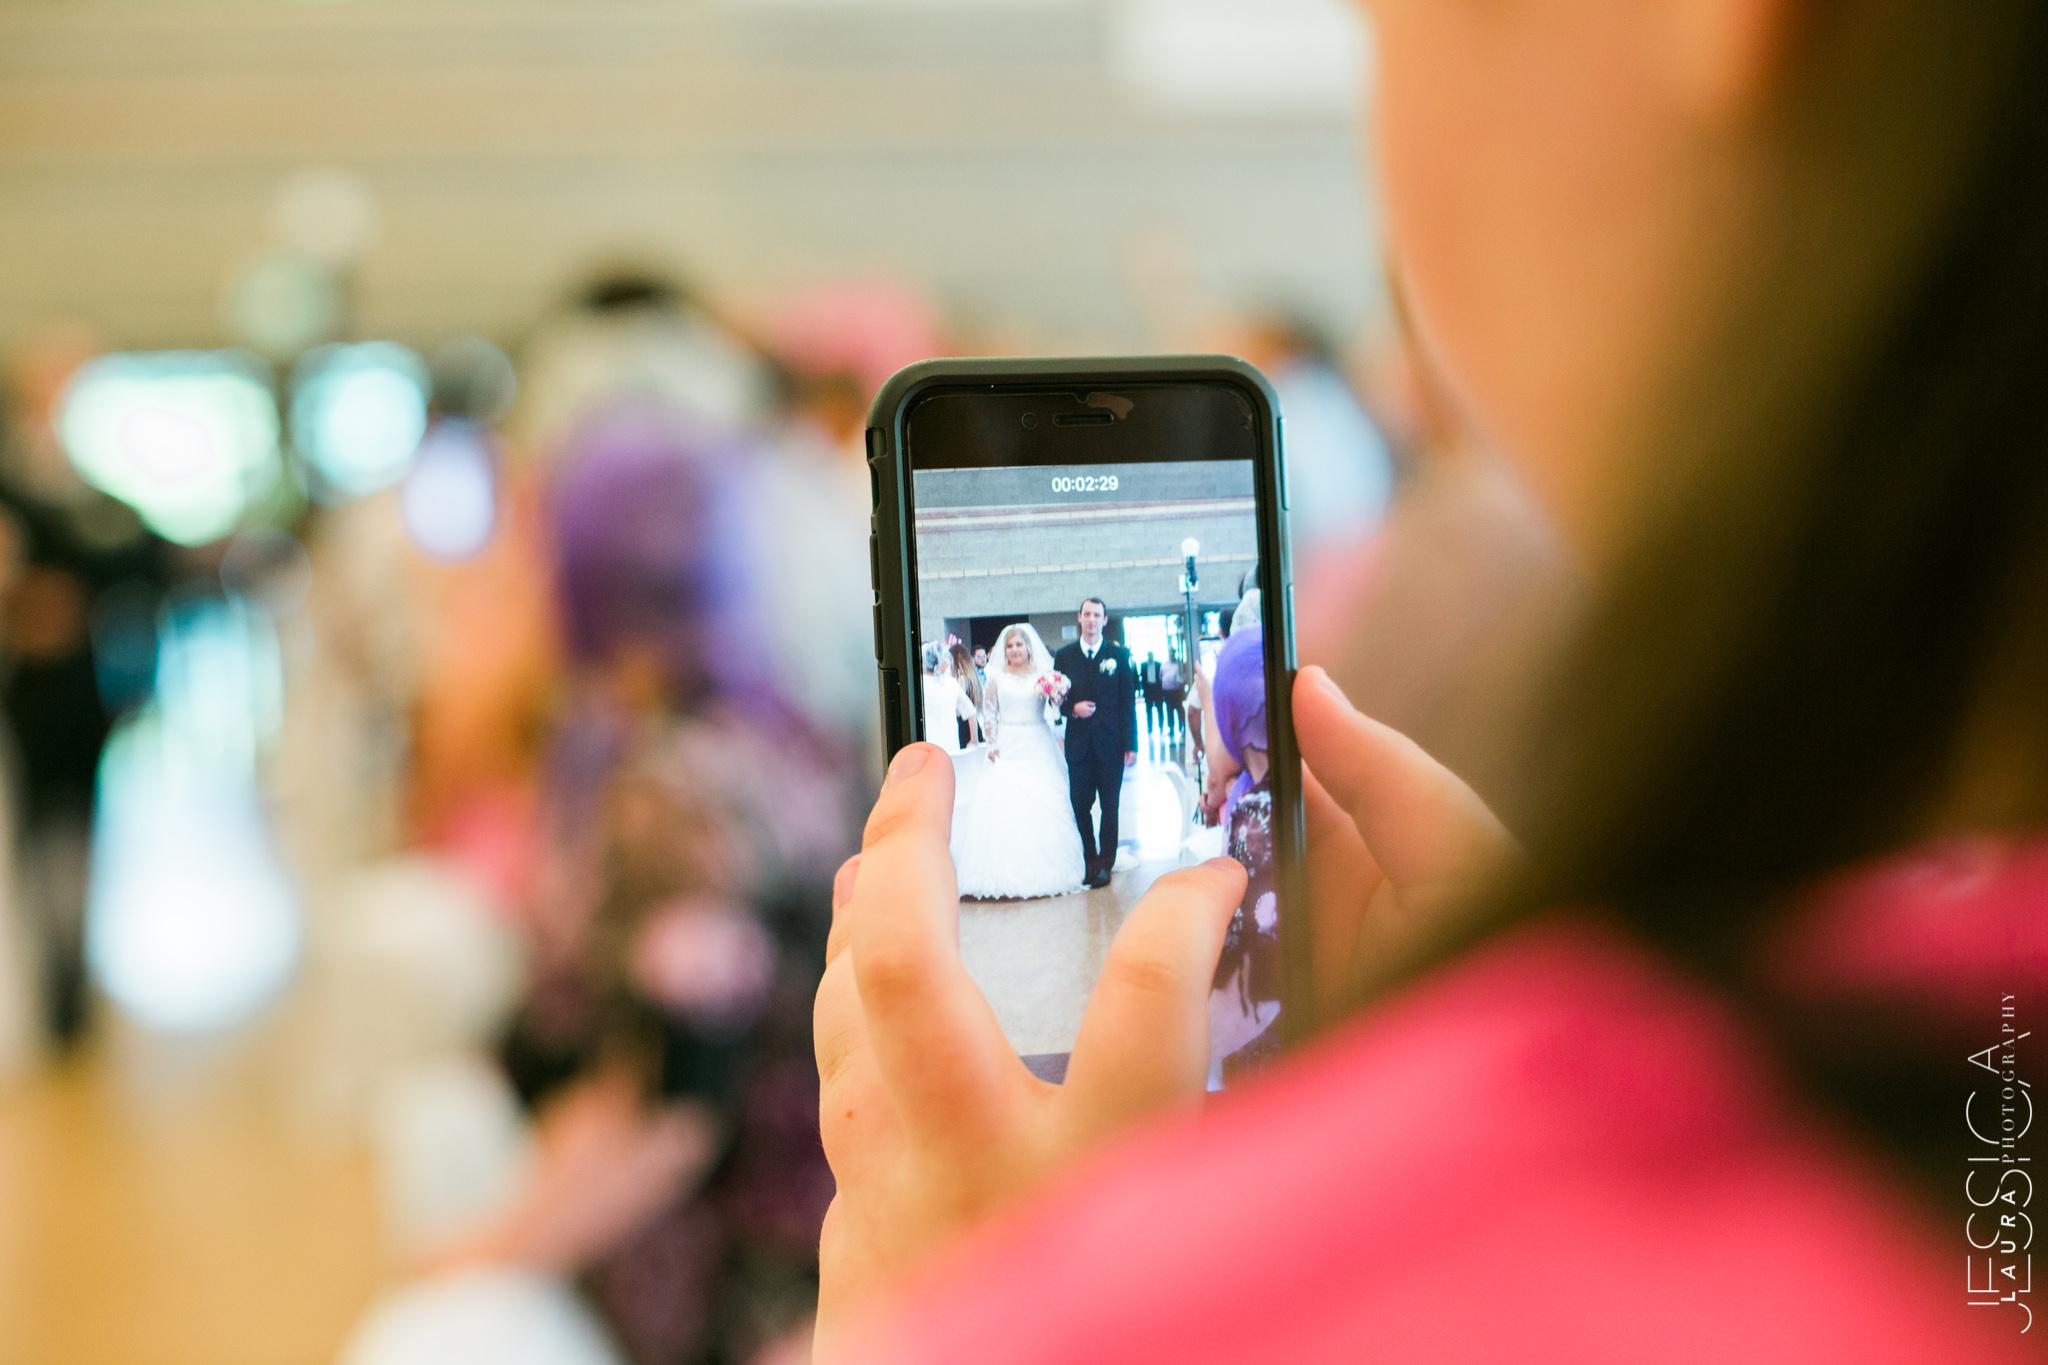 Eugene-Maryana_wedding_08062017_web (375 of 558).JPG